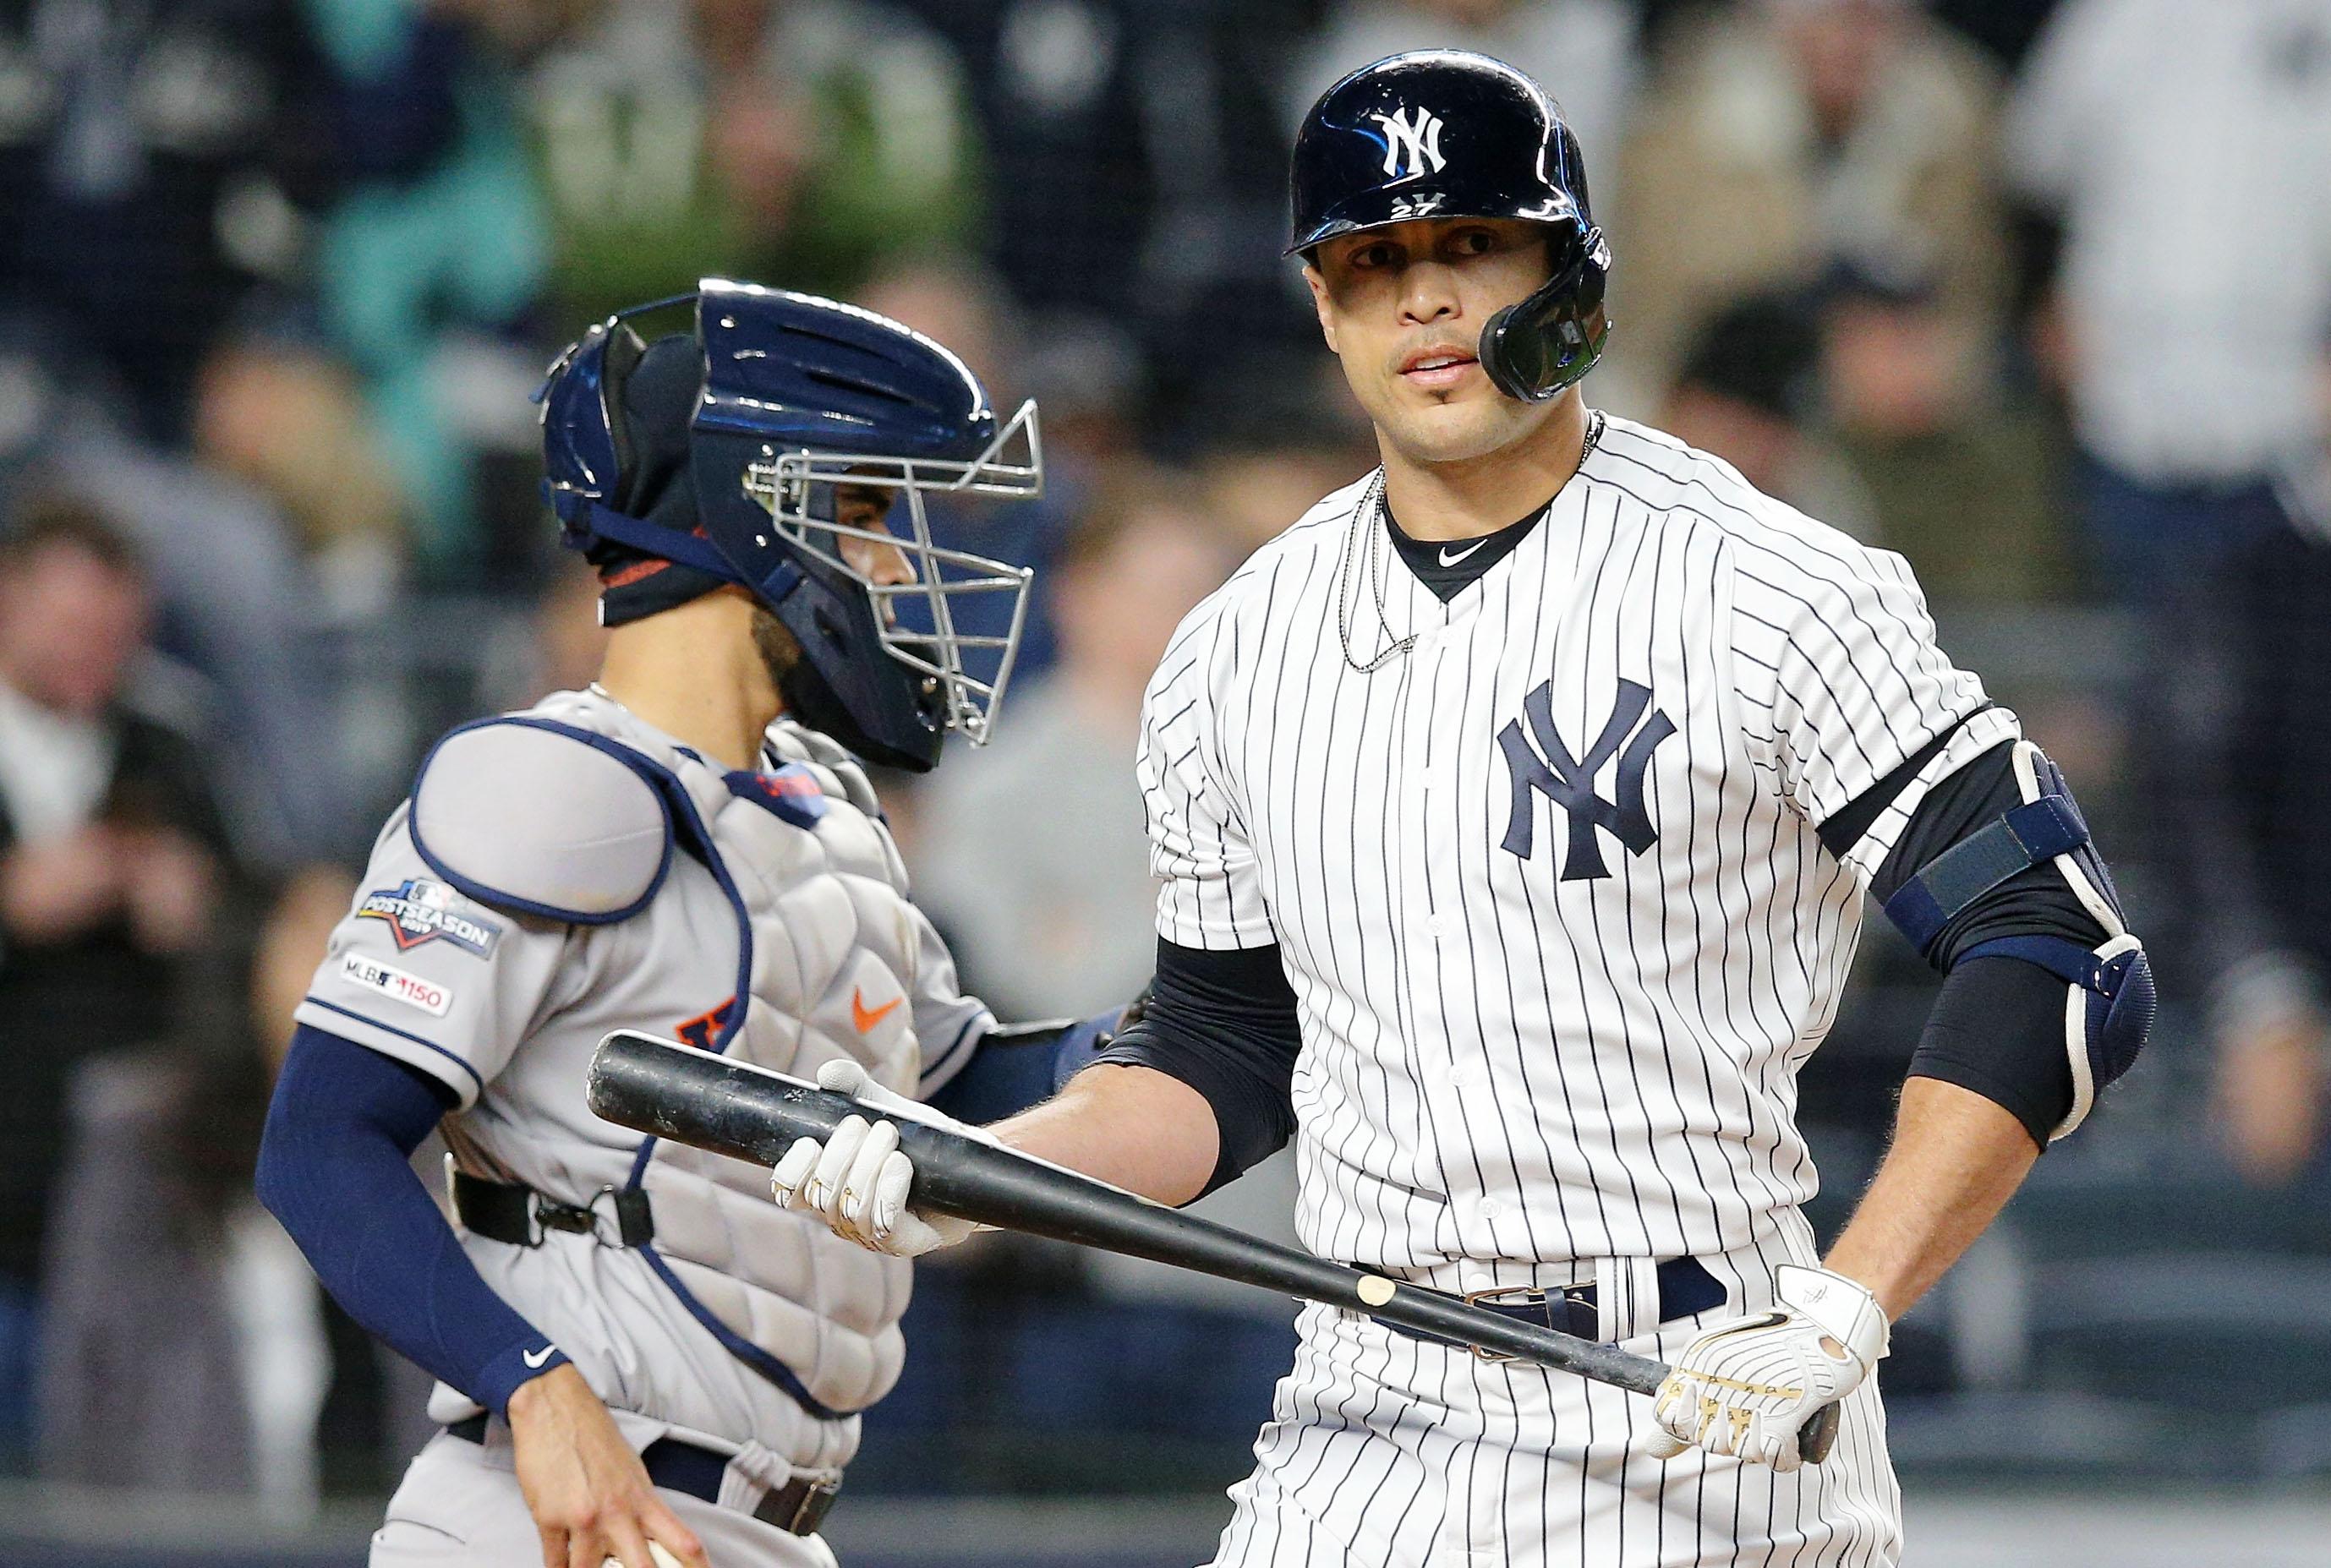 Giancarlo Stanton lobbies for Yankees to sign both Stephen Strasburg, Gerrit Cole